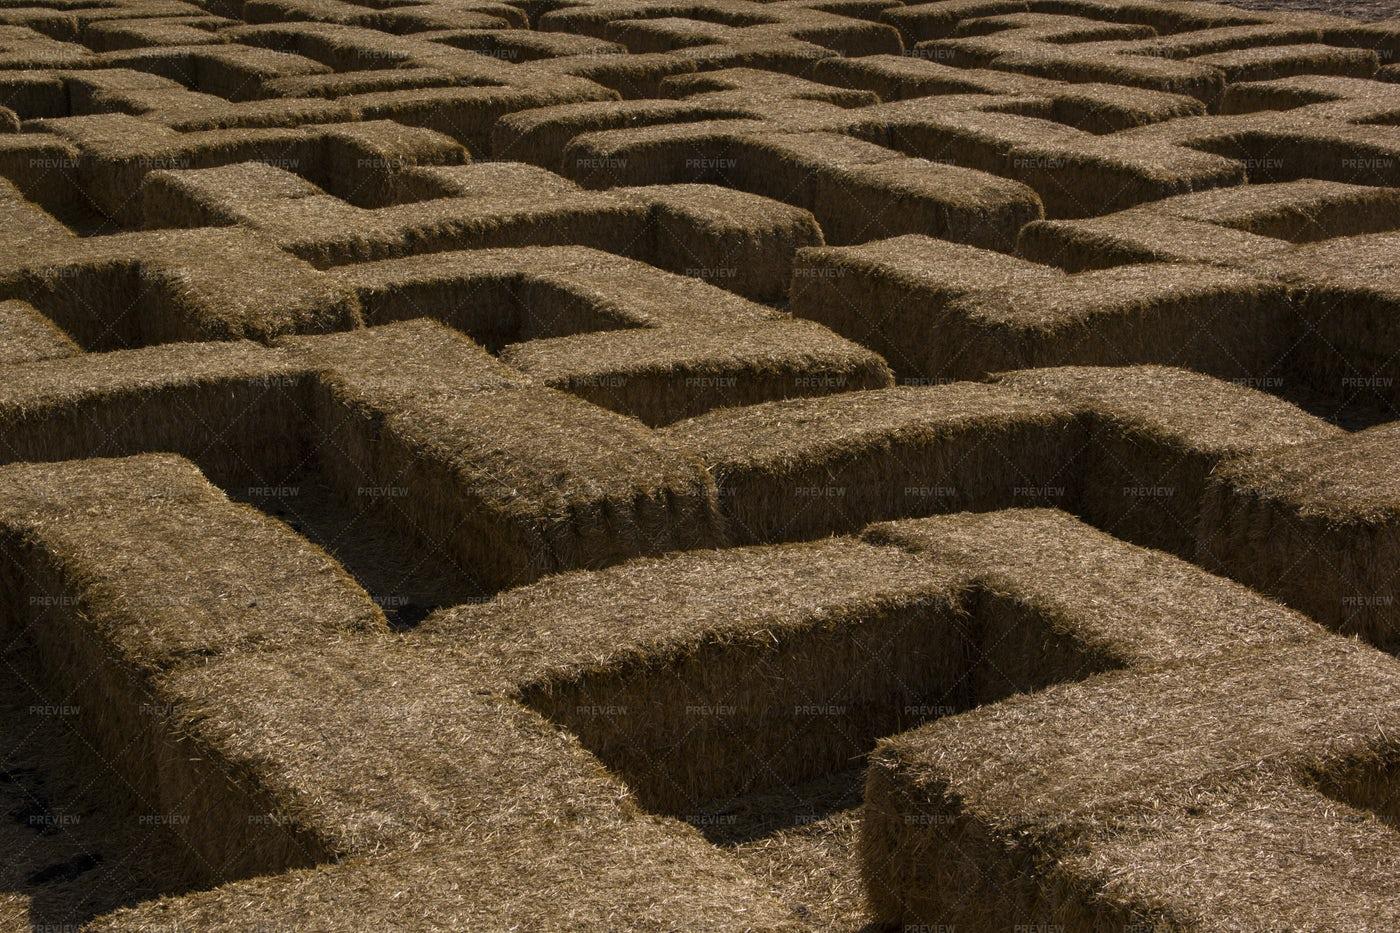 Straw Bales Labyrinth: Stock Photos